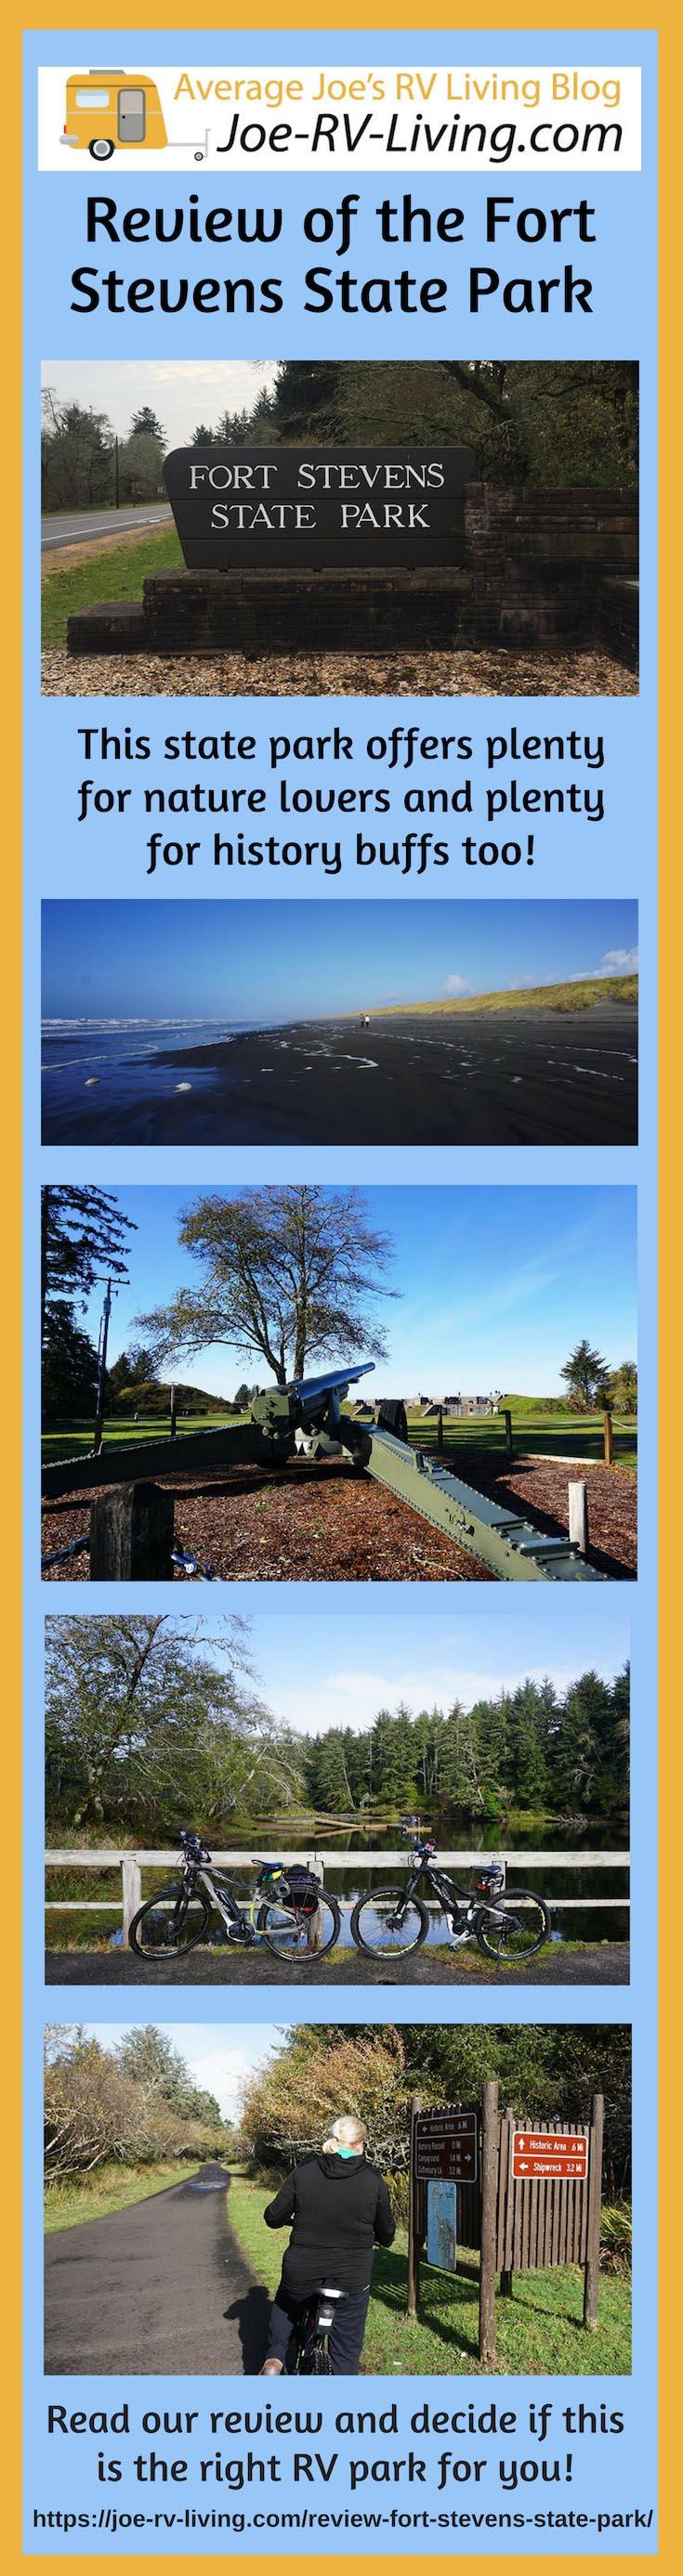 Review of Fort Stevens State Park, Northern Oregon Coast